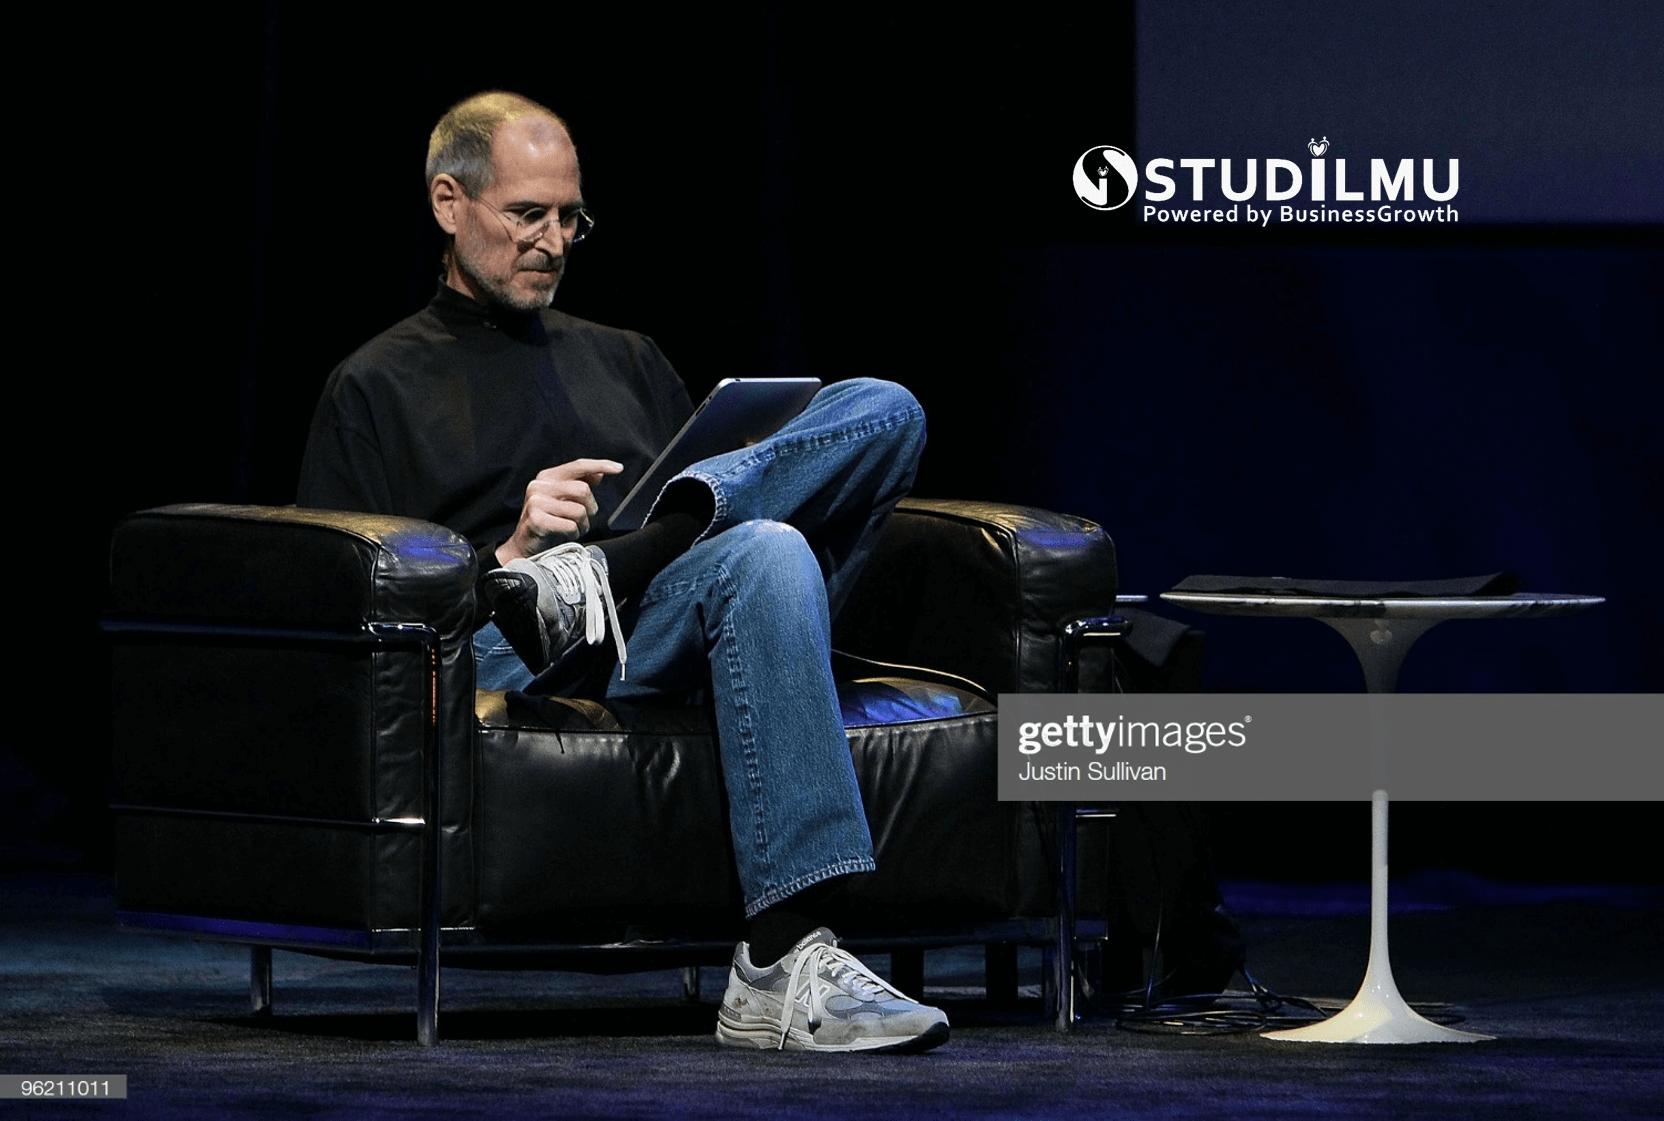 STUDILMU Career Advice - Bagaimana Cara Memiliki Mimpi Besar ala Steve Jobs?